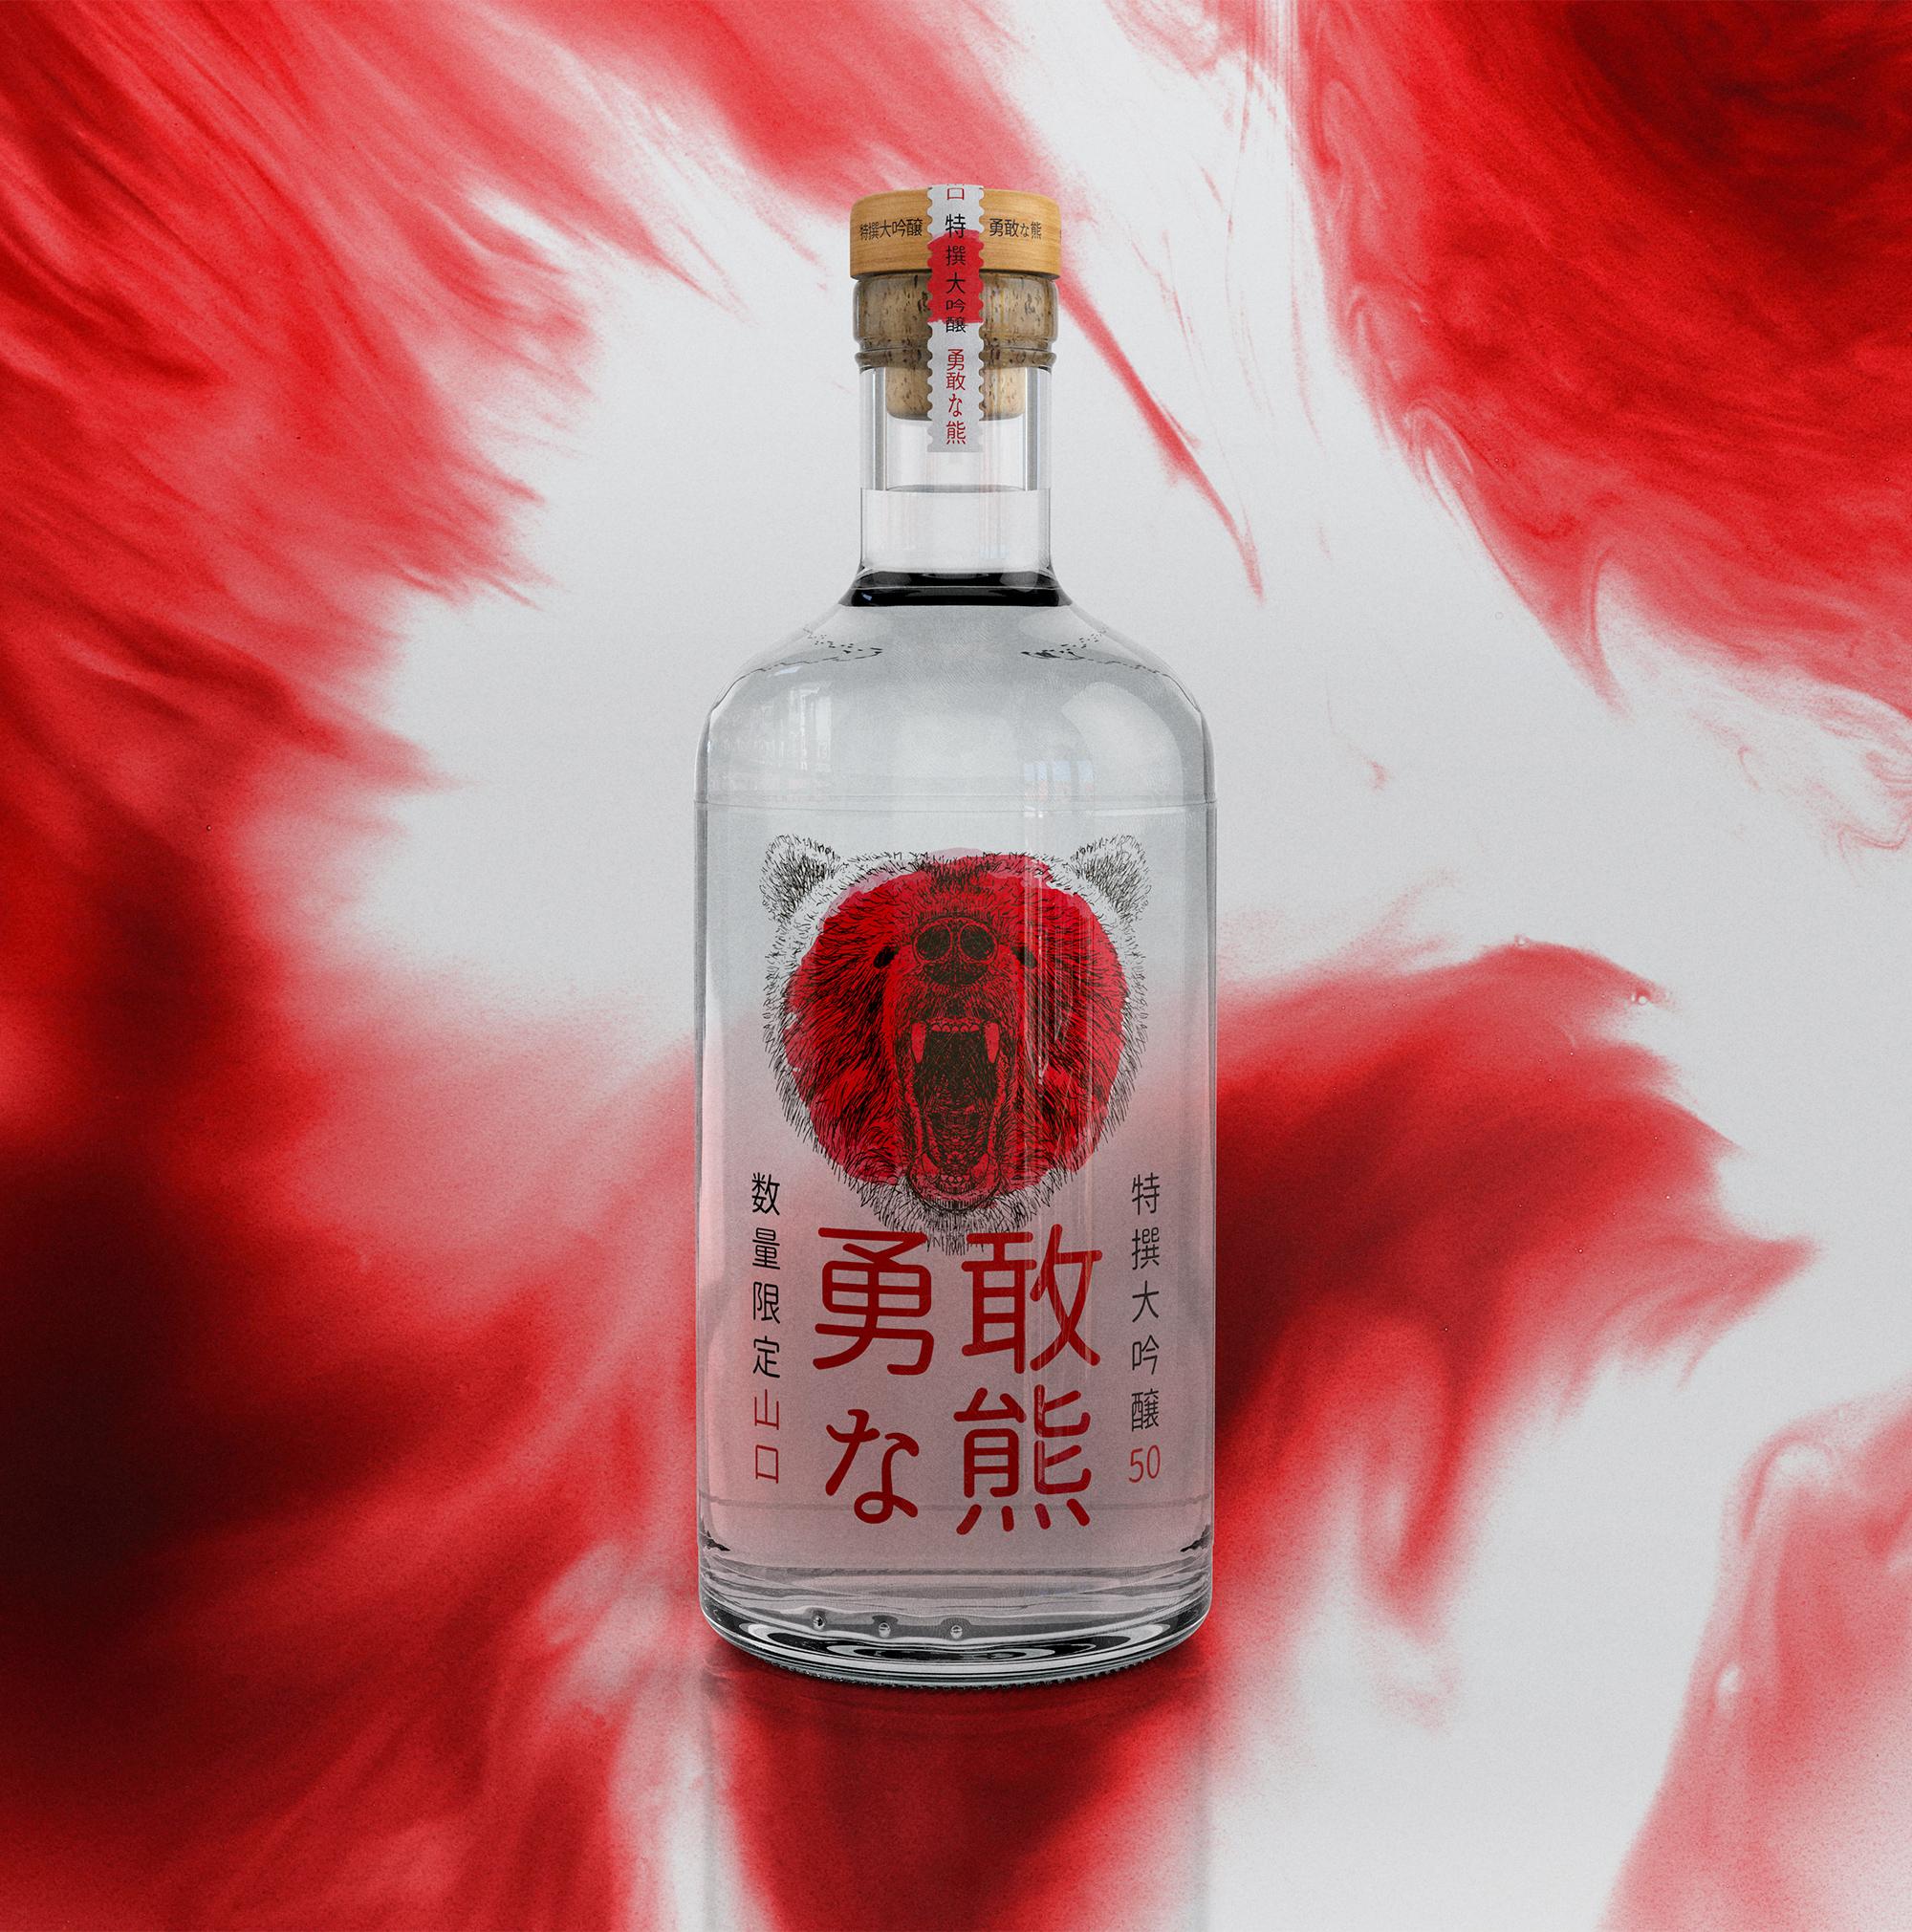 Brave Bear Special Japanese Sake, Brand and Packaging Design